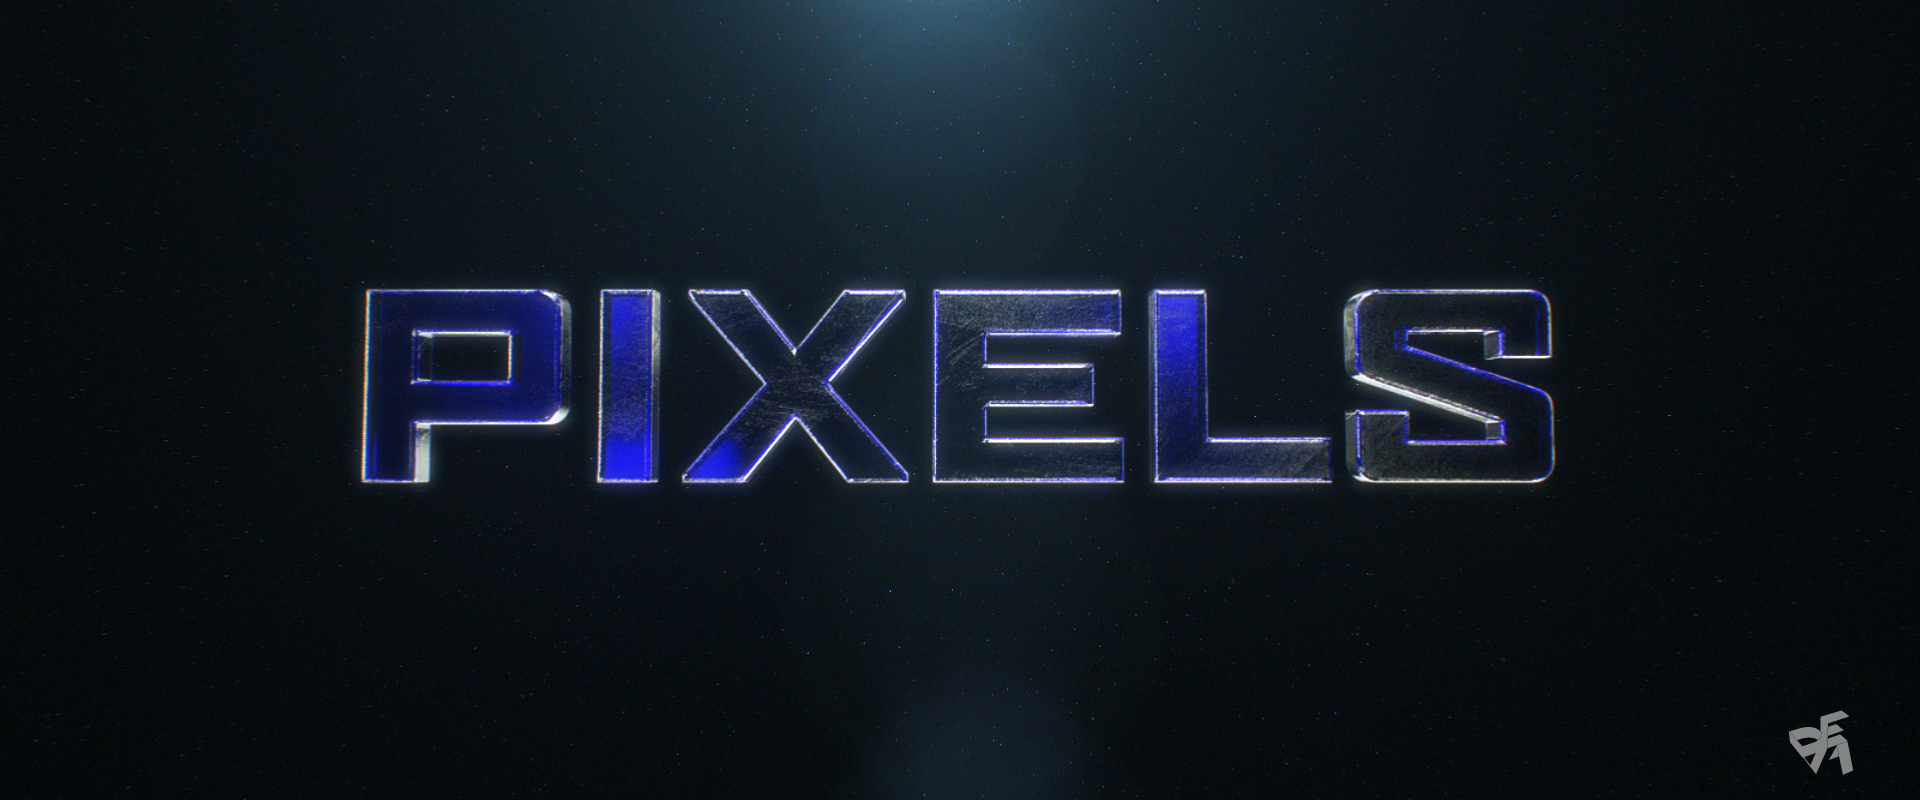 Pixels-STYLEFRAME_06.jpg